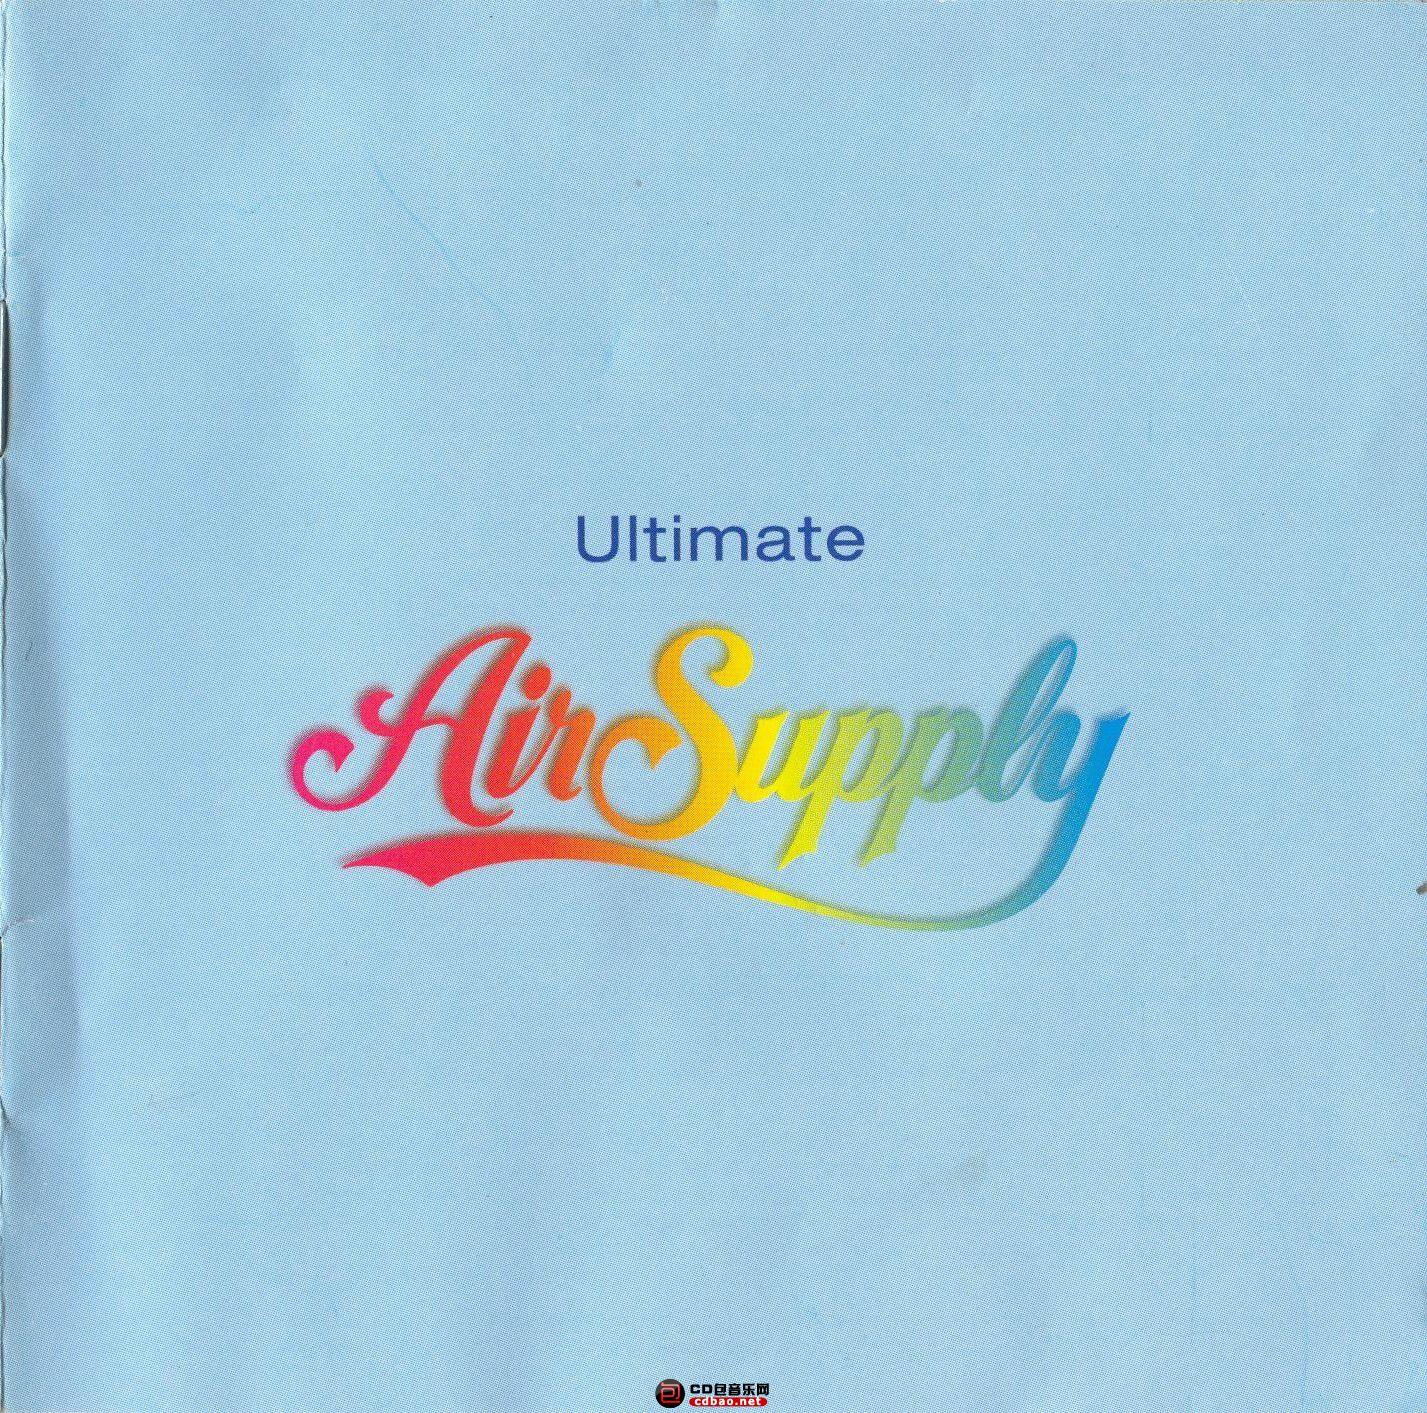 AirSupply - Ultimate Air Supply - Front.jpg